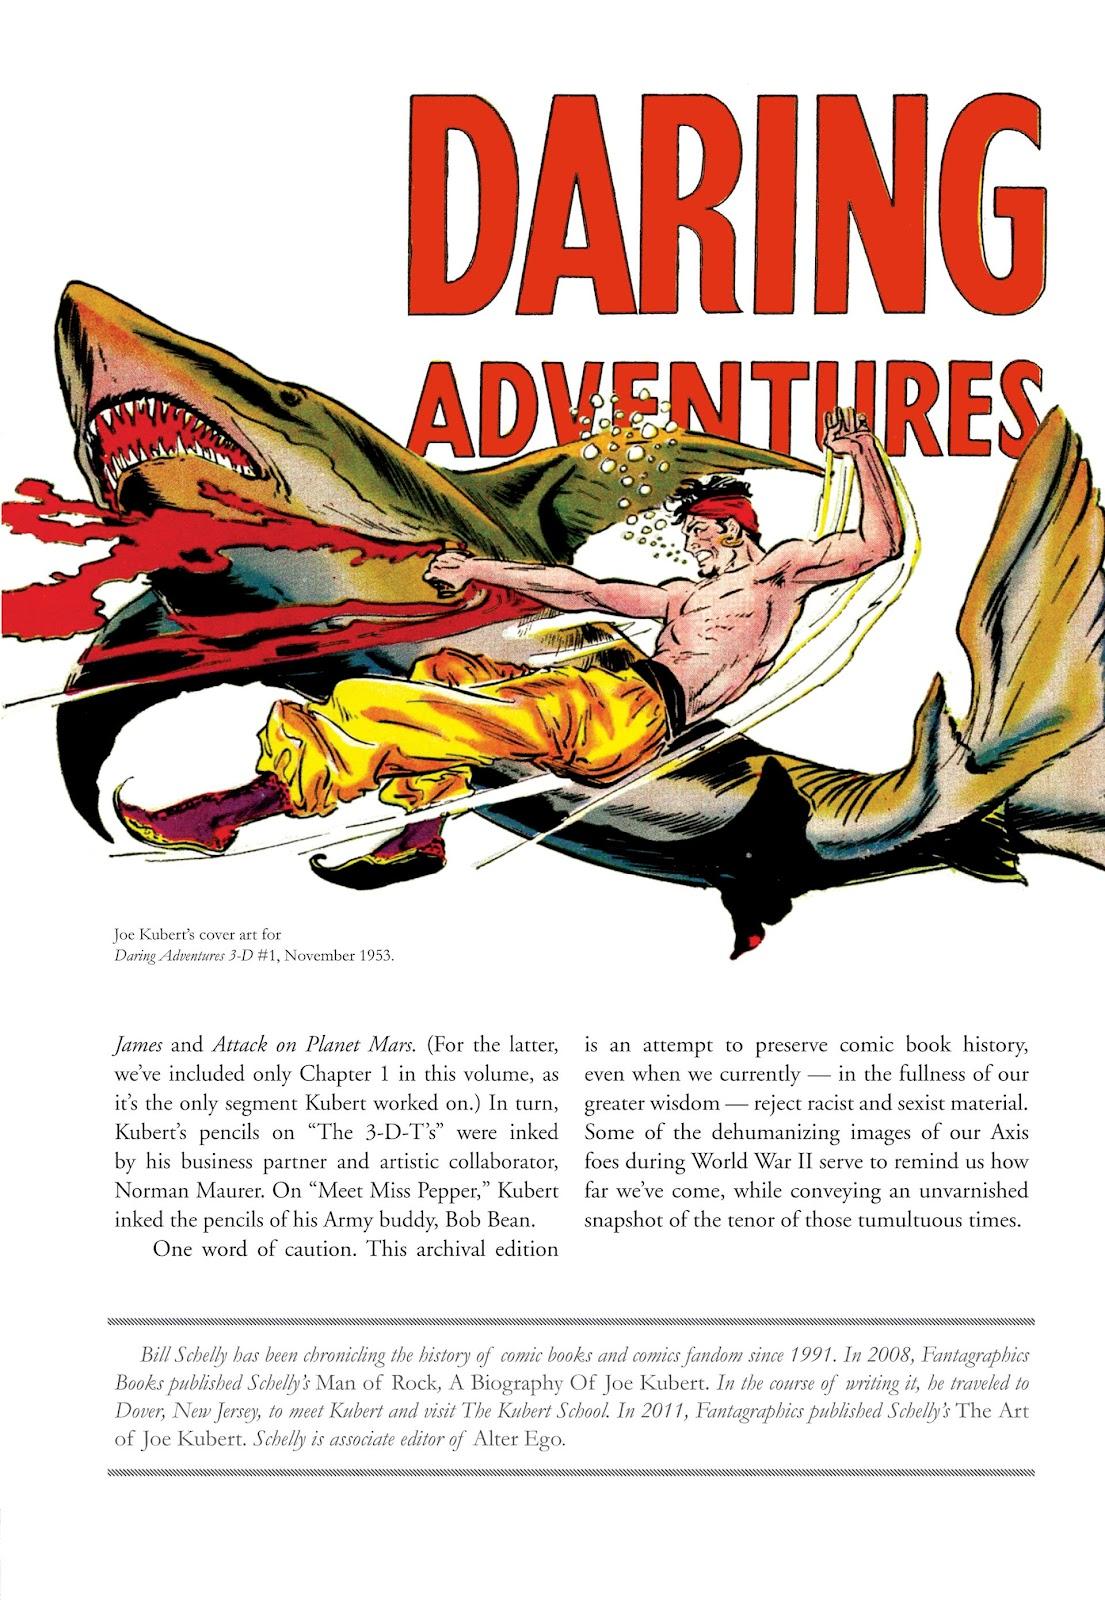 Read online The Joe Kubert Archives comic -  Issue # TPB (Part 1) - 8